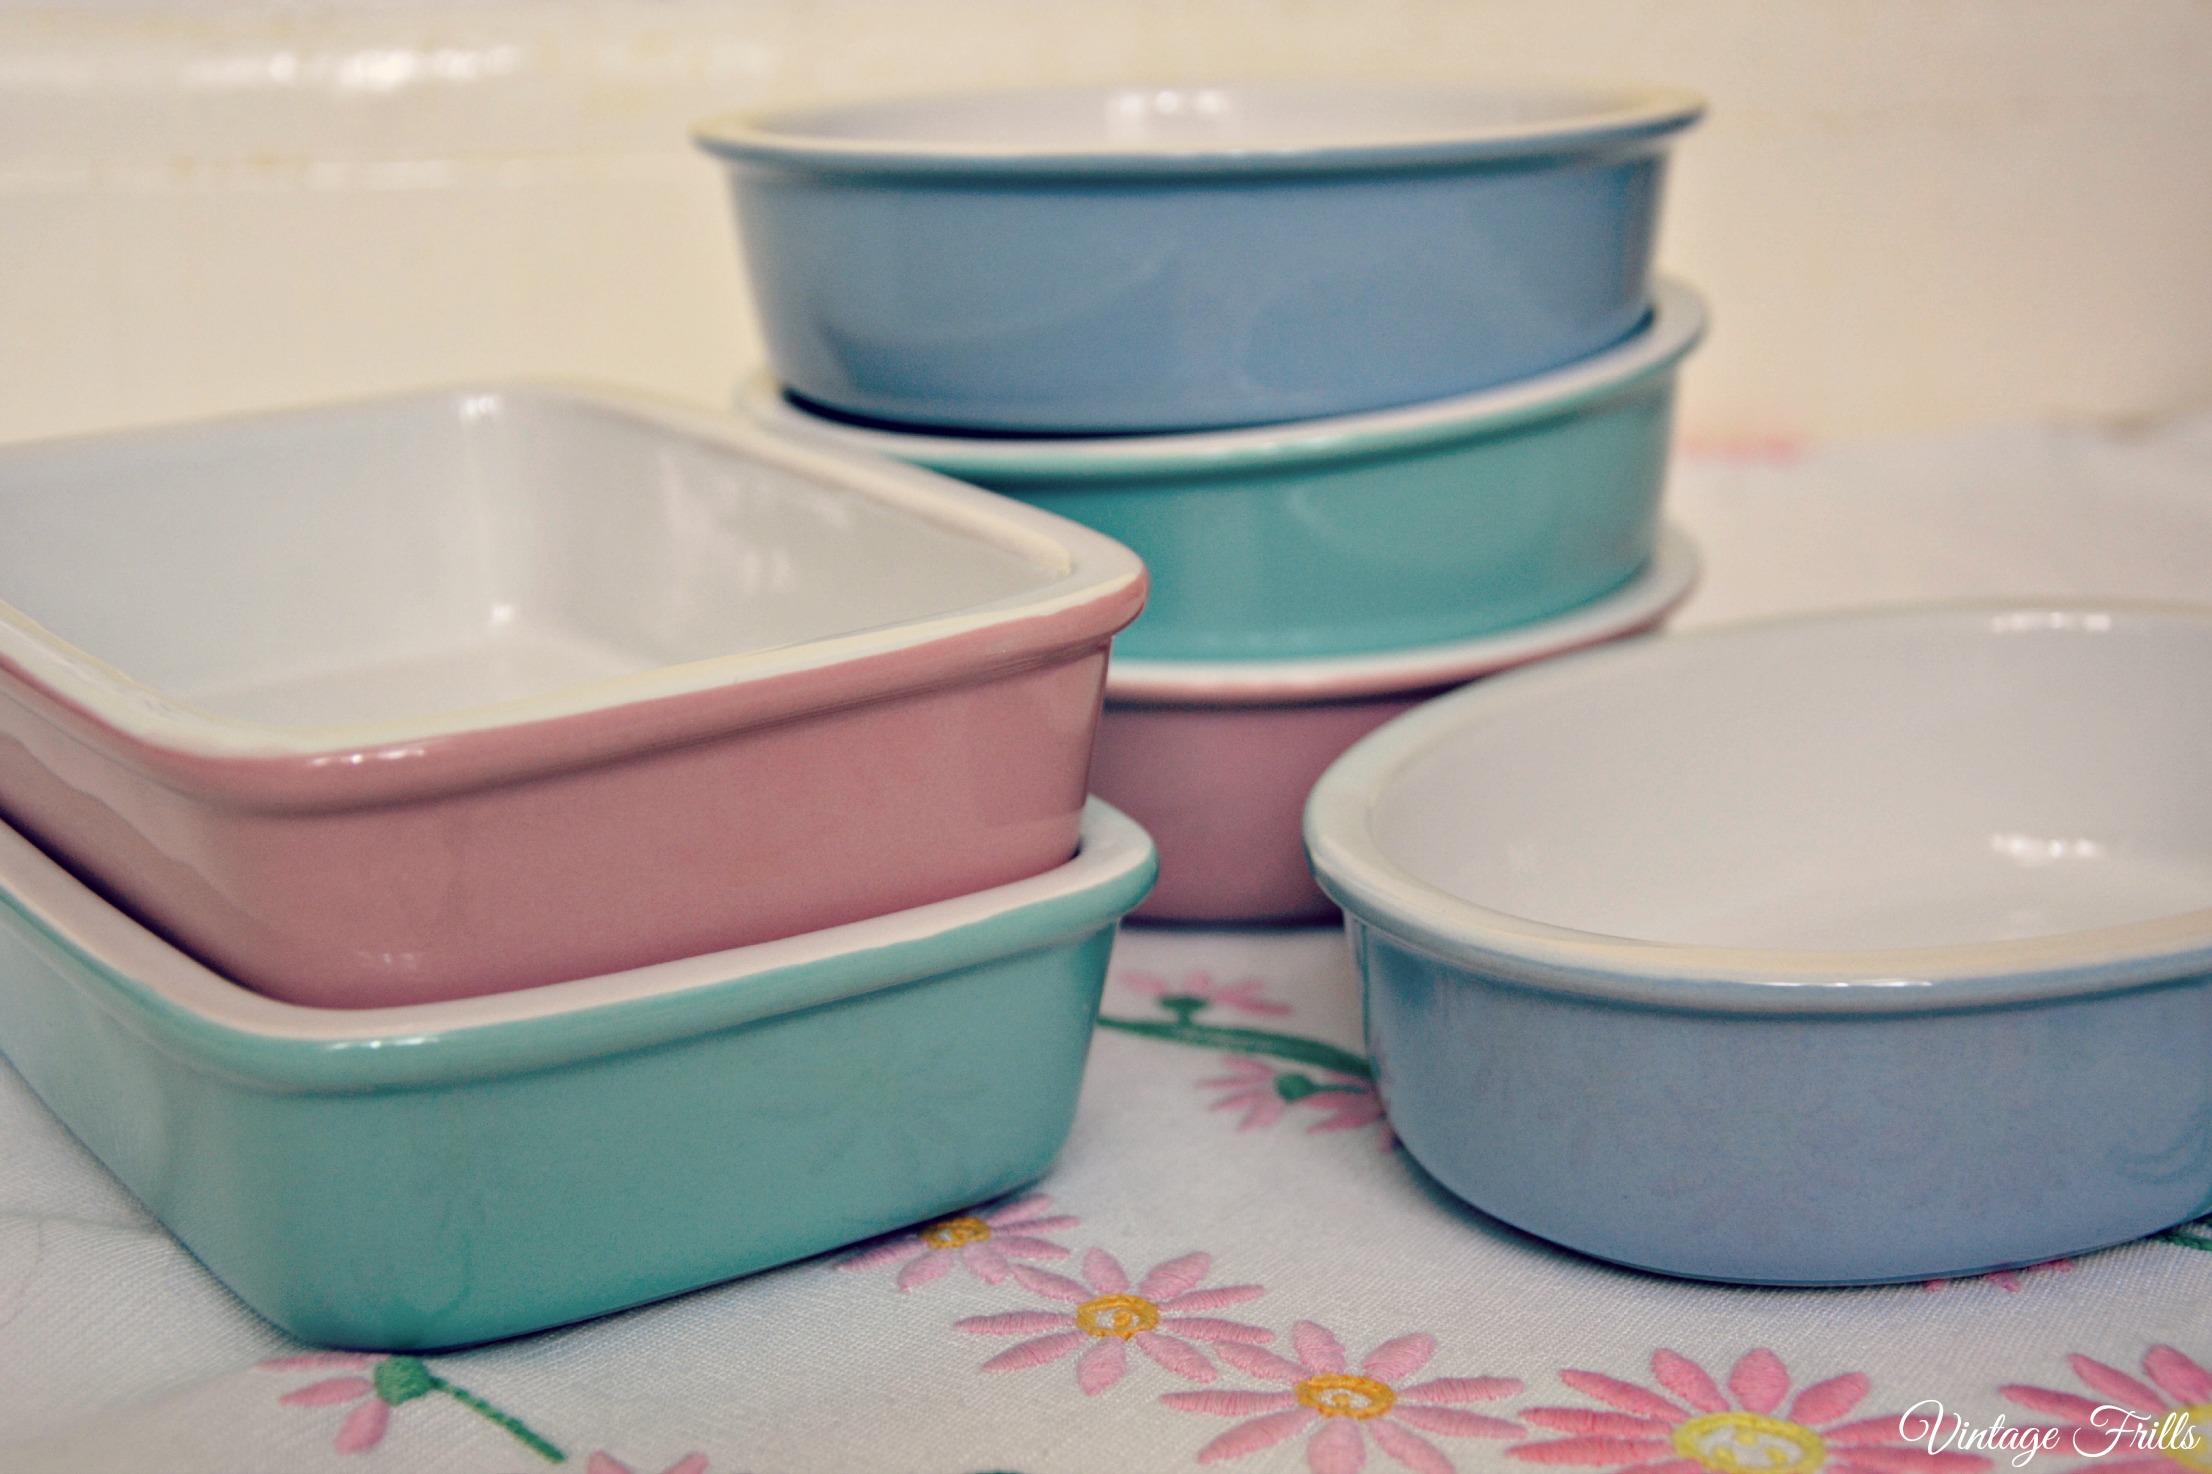 White apron poundland - Poundland Ceramic Bakeware